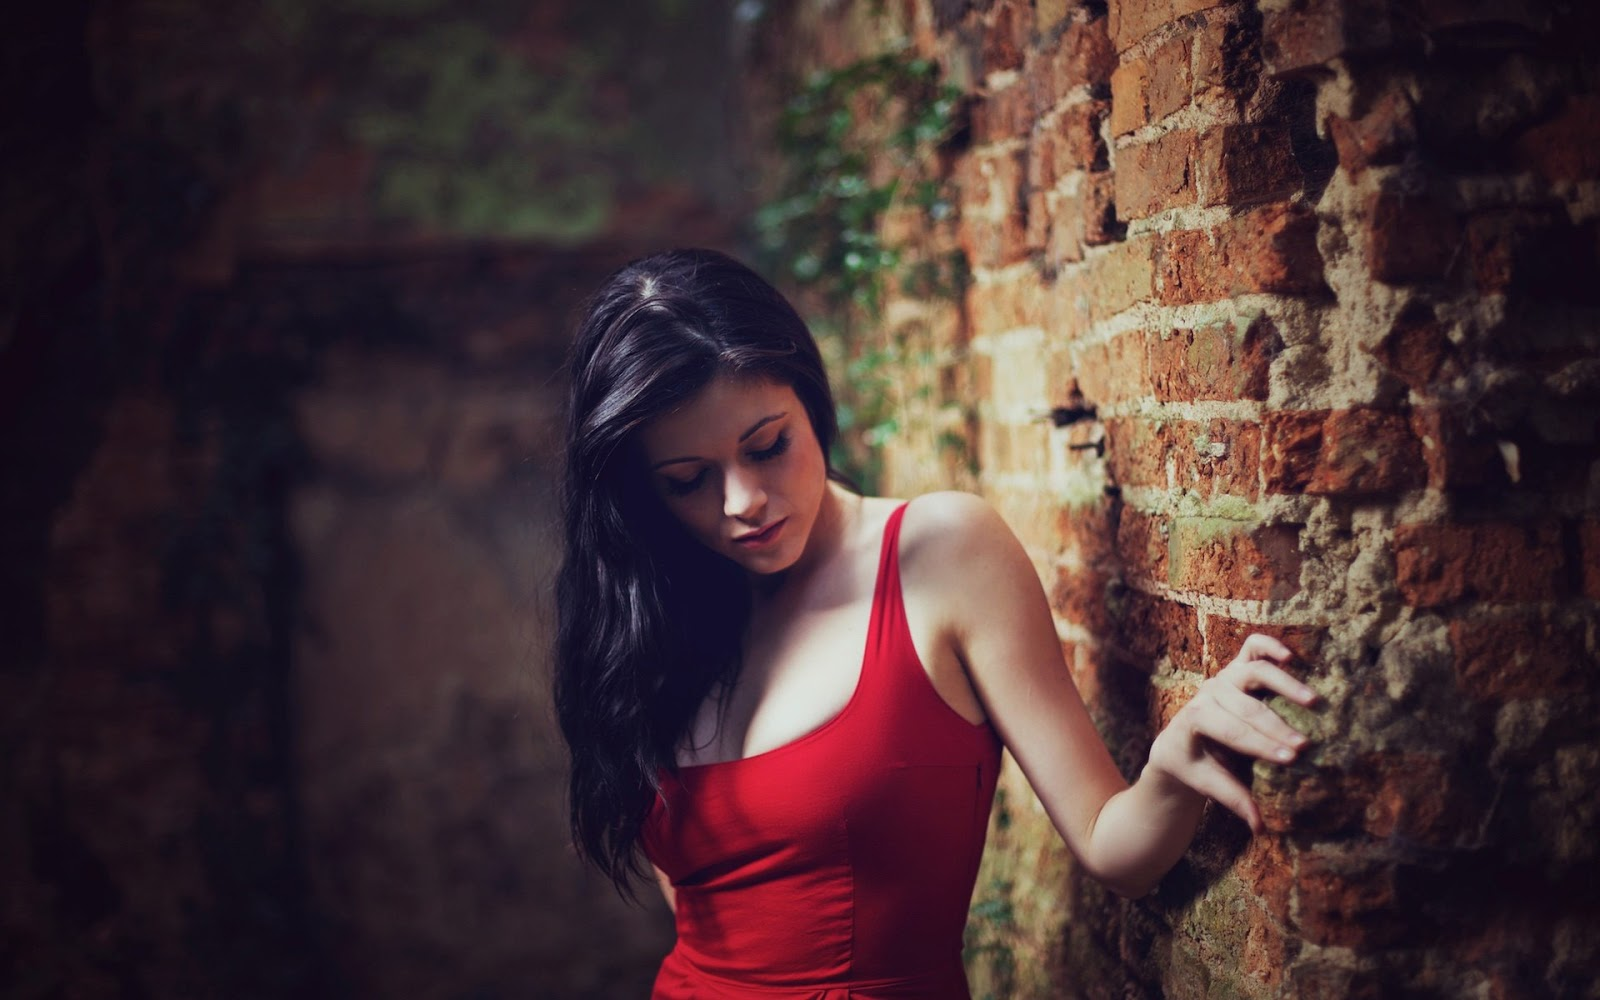 hd wallpapers women models - photo #10